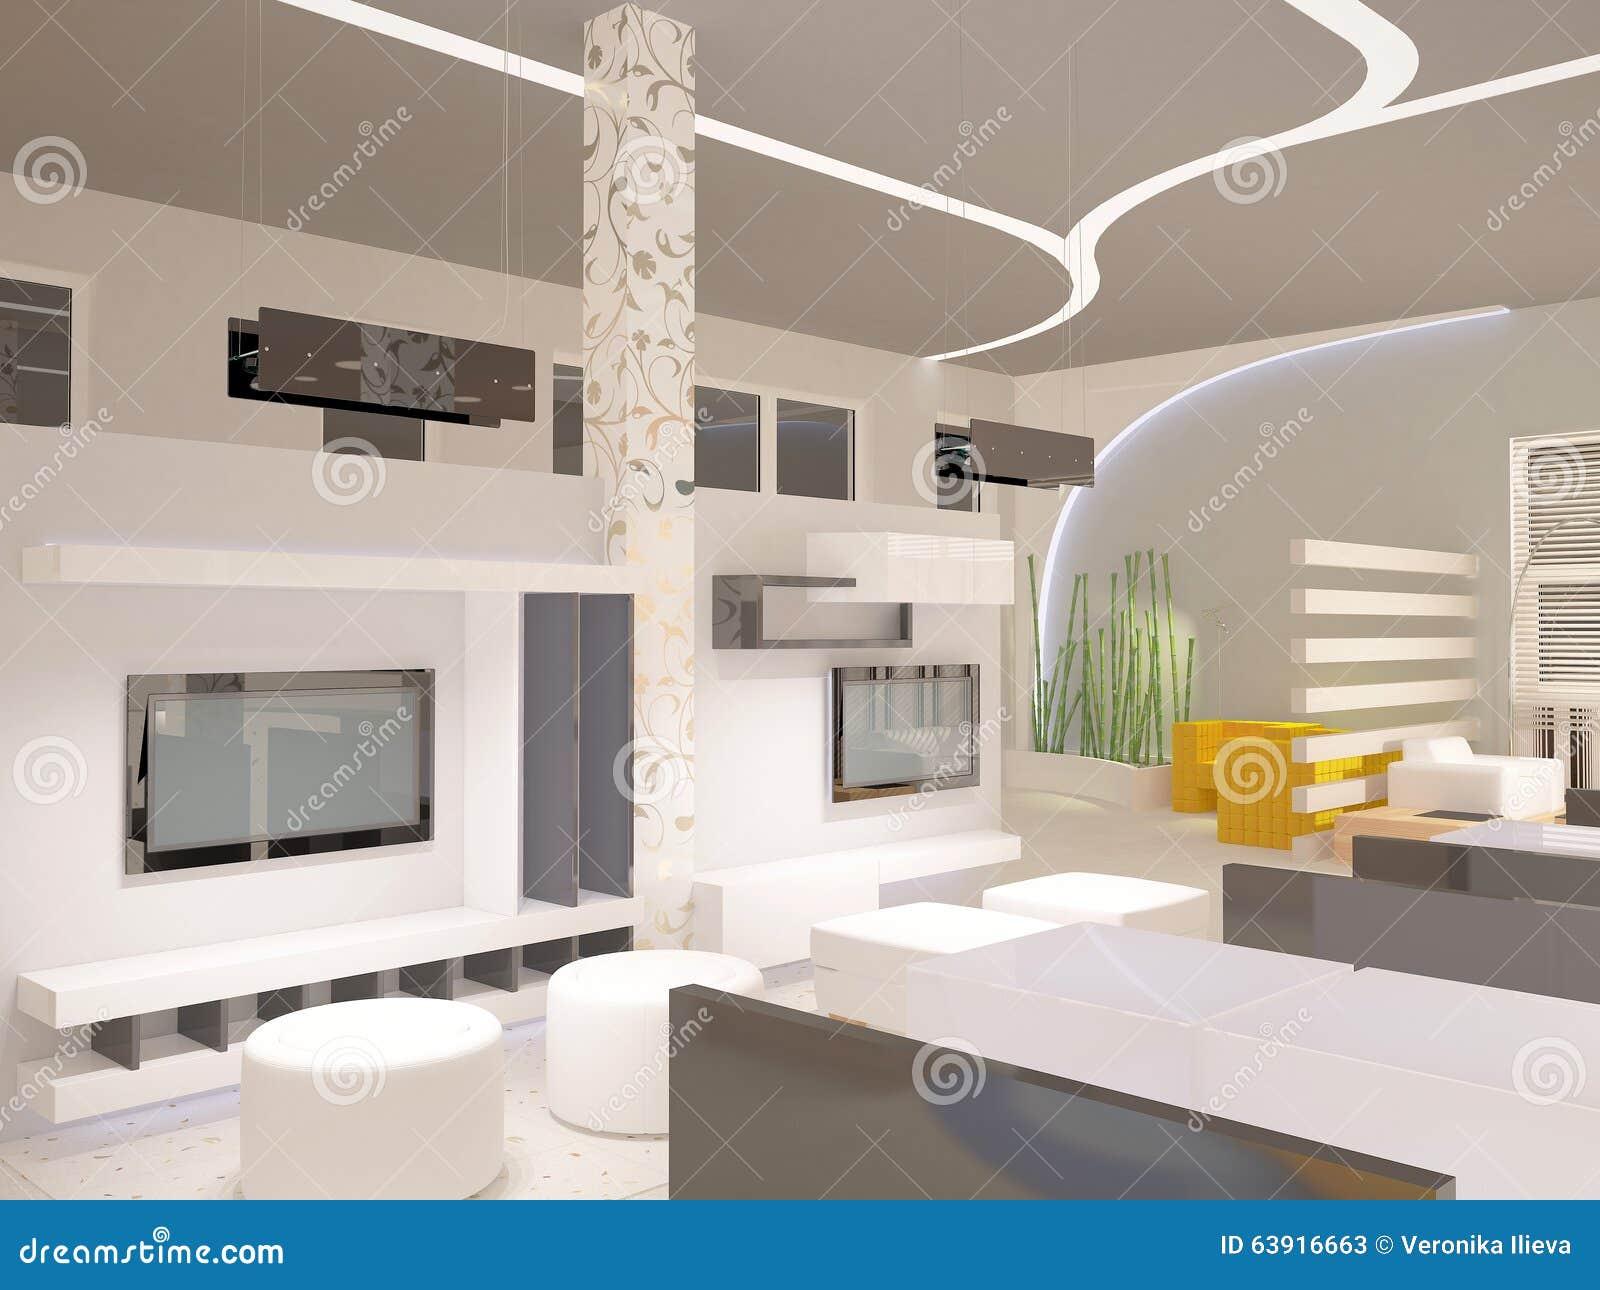 Royalty Free Illustration Download 3D Visualization Of A Showroom Interior Design